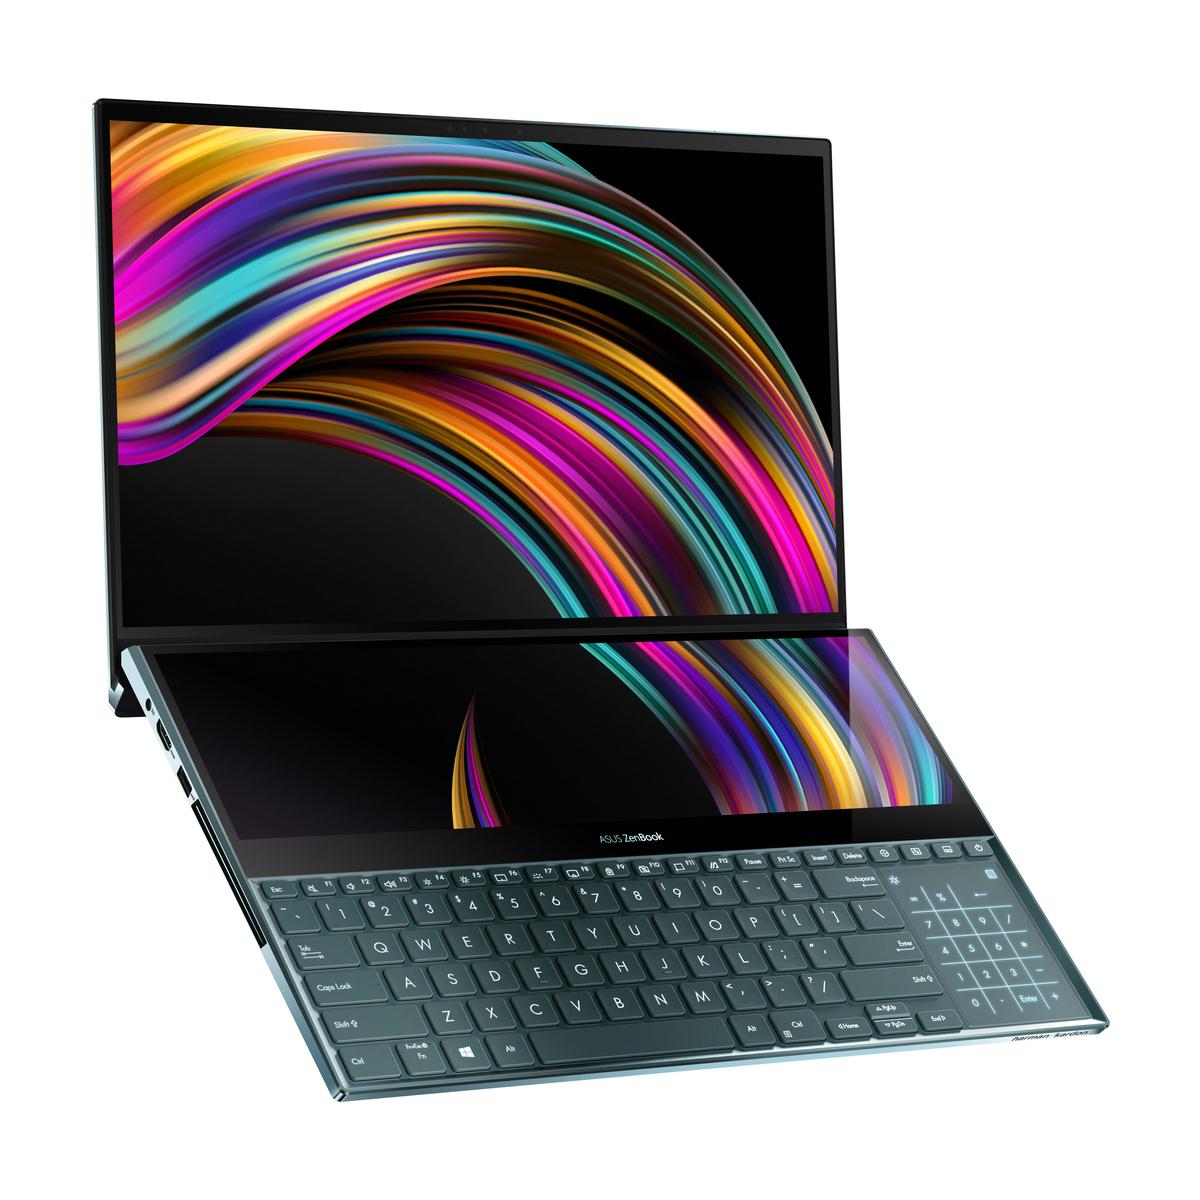 ASUS ZenBook Pro 15 UX580GE | Laptop | ASUS